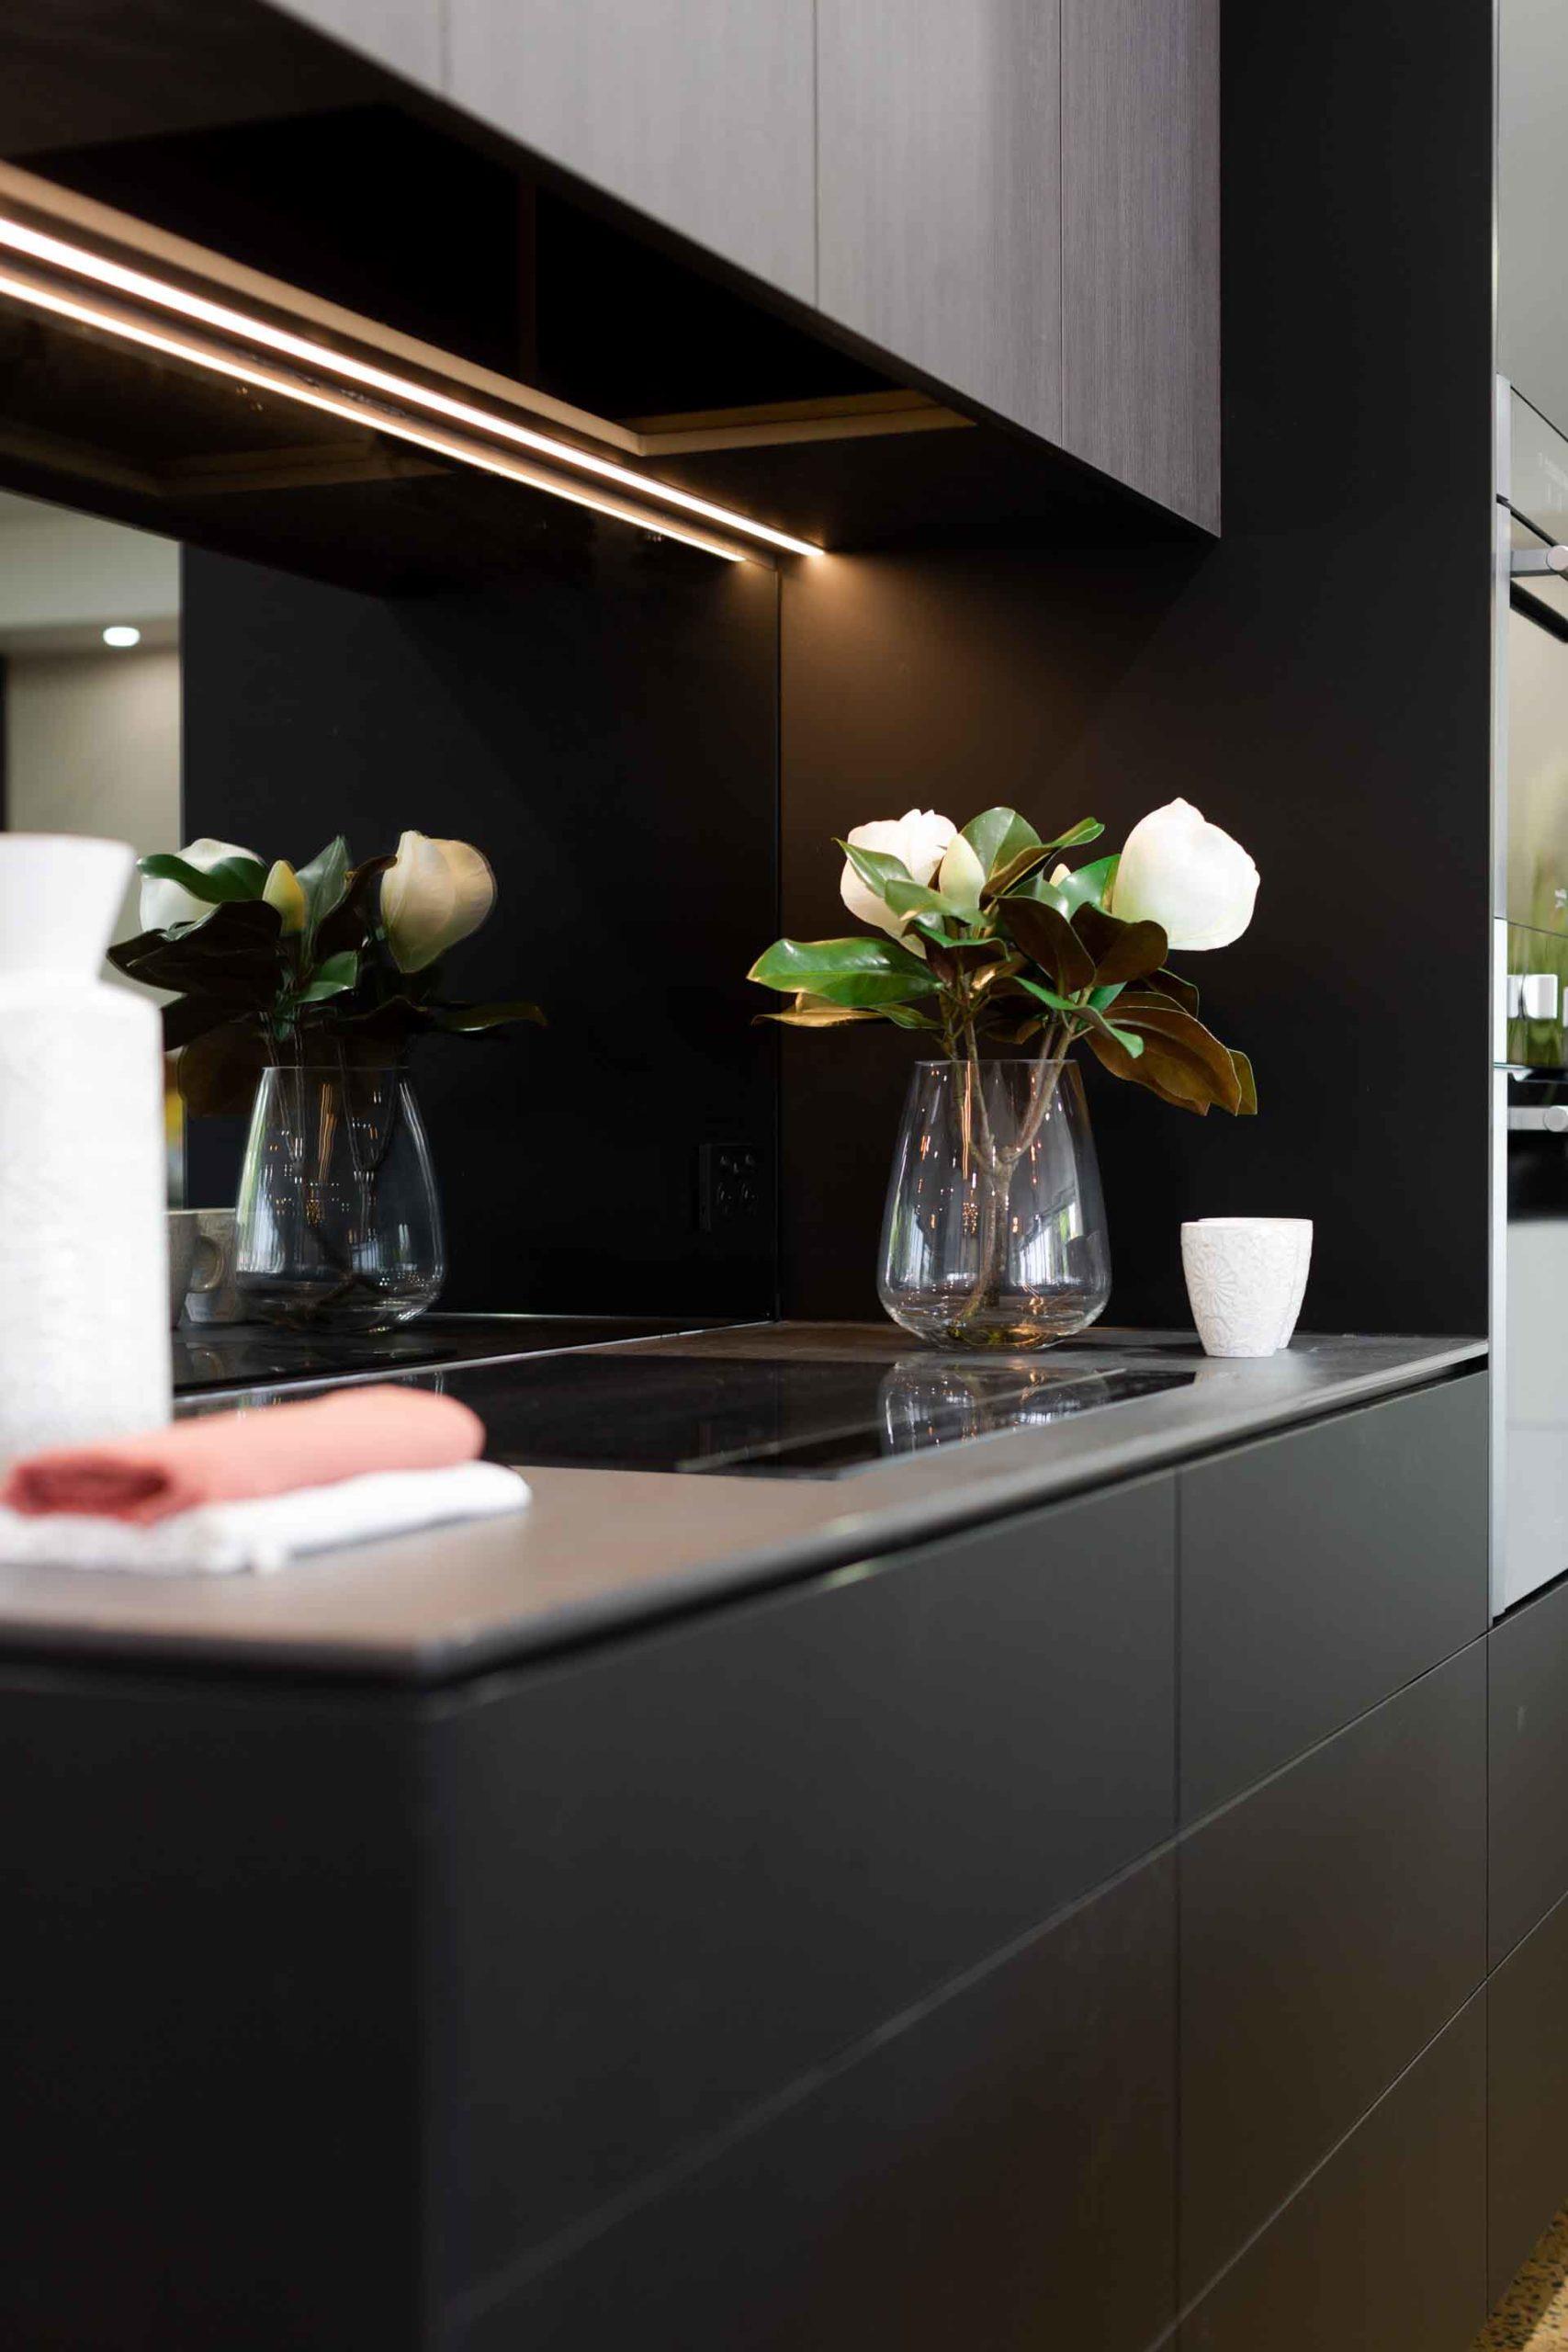 Leopard_Lens_Photography_Inarc_Design_Simson_Kitchen_Showroom-44